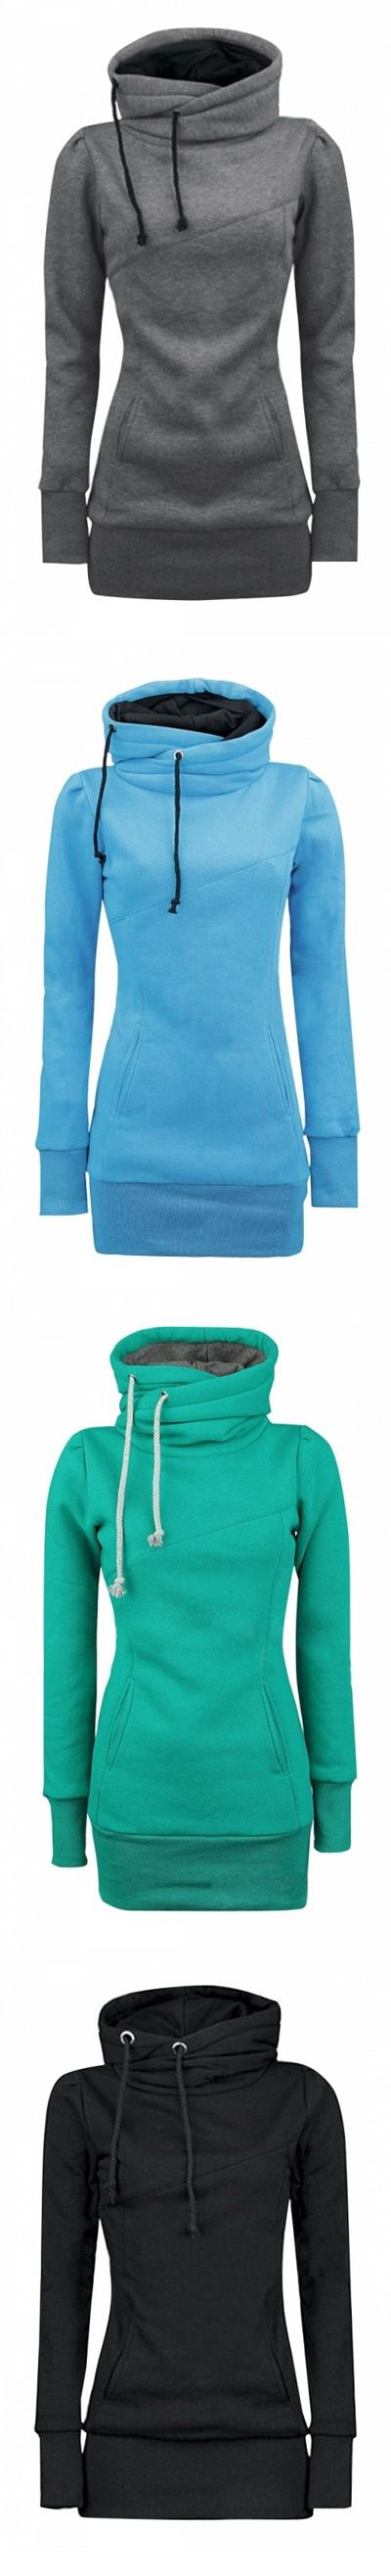 FREE SHIPPING+ womens-solid-turtle-neck-long-sleeve-kangaroo-pocket-sweatshirt